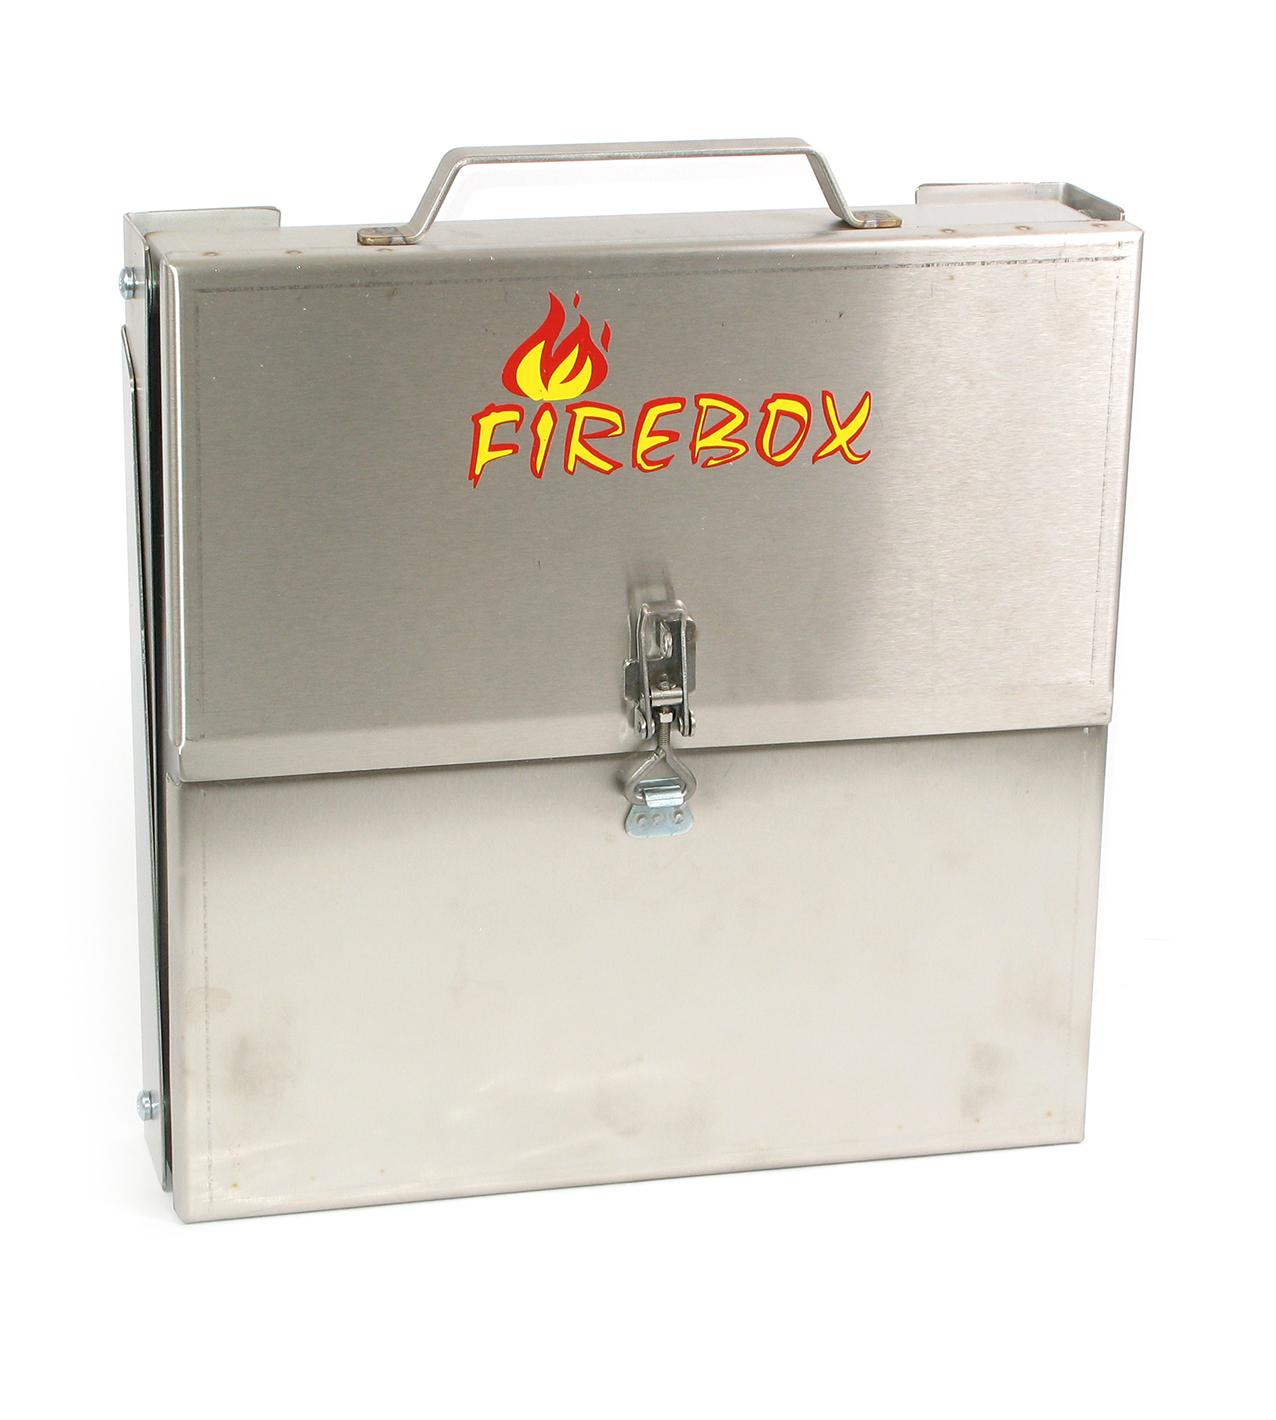 Firebox 4P Hopfällbar Eldstad Rostfri